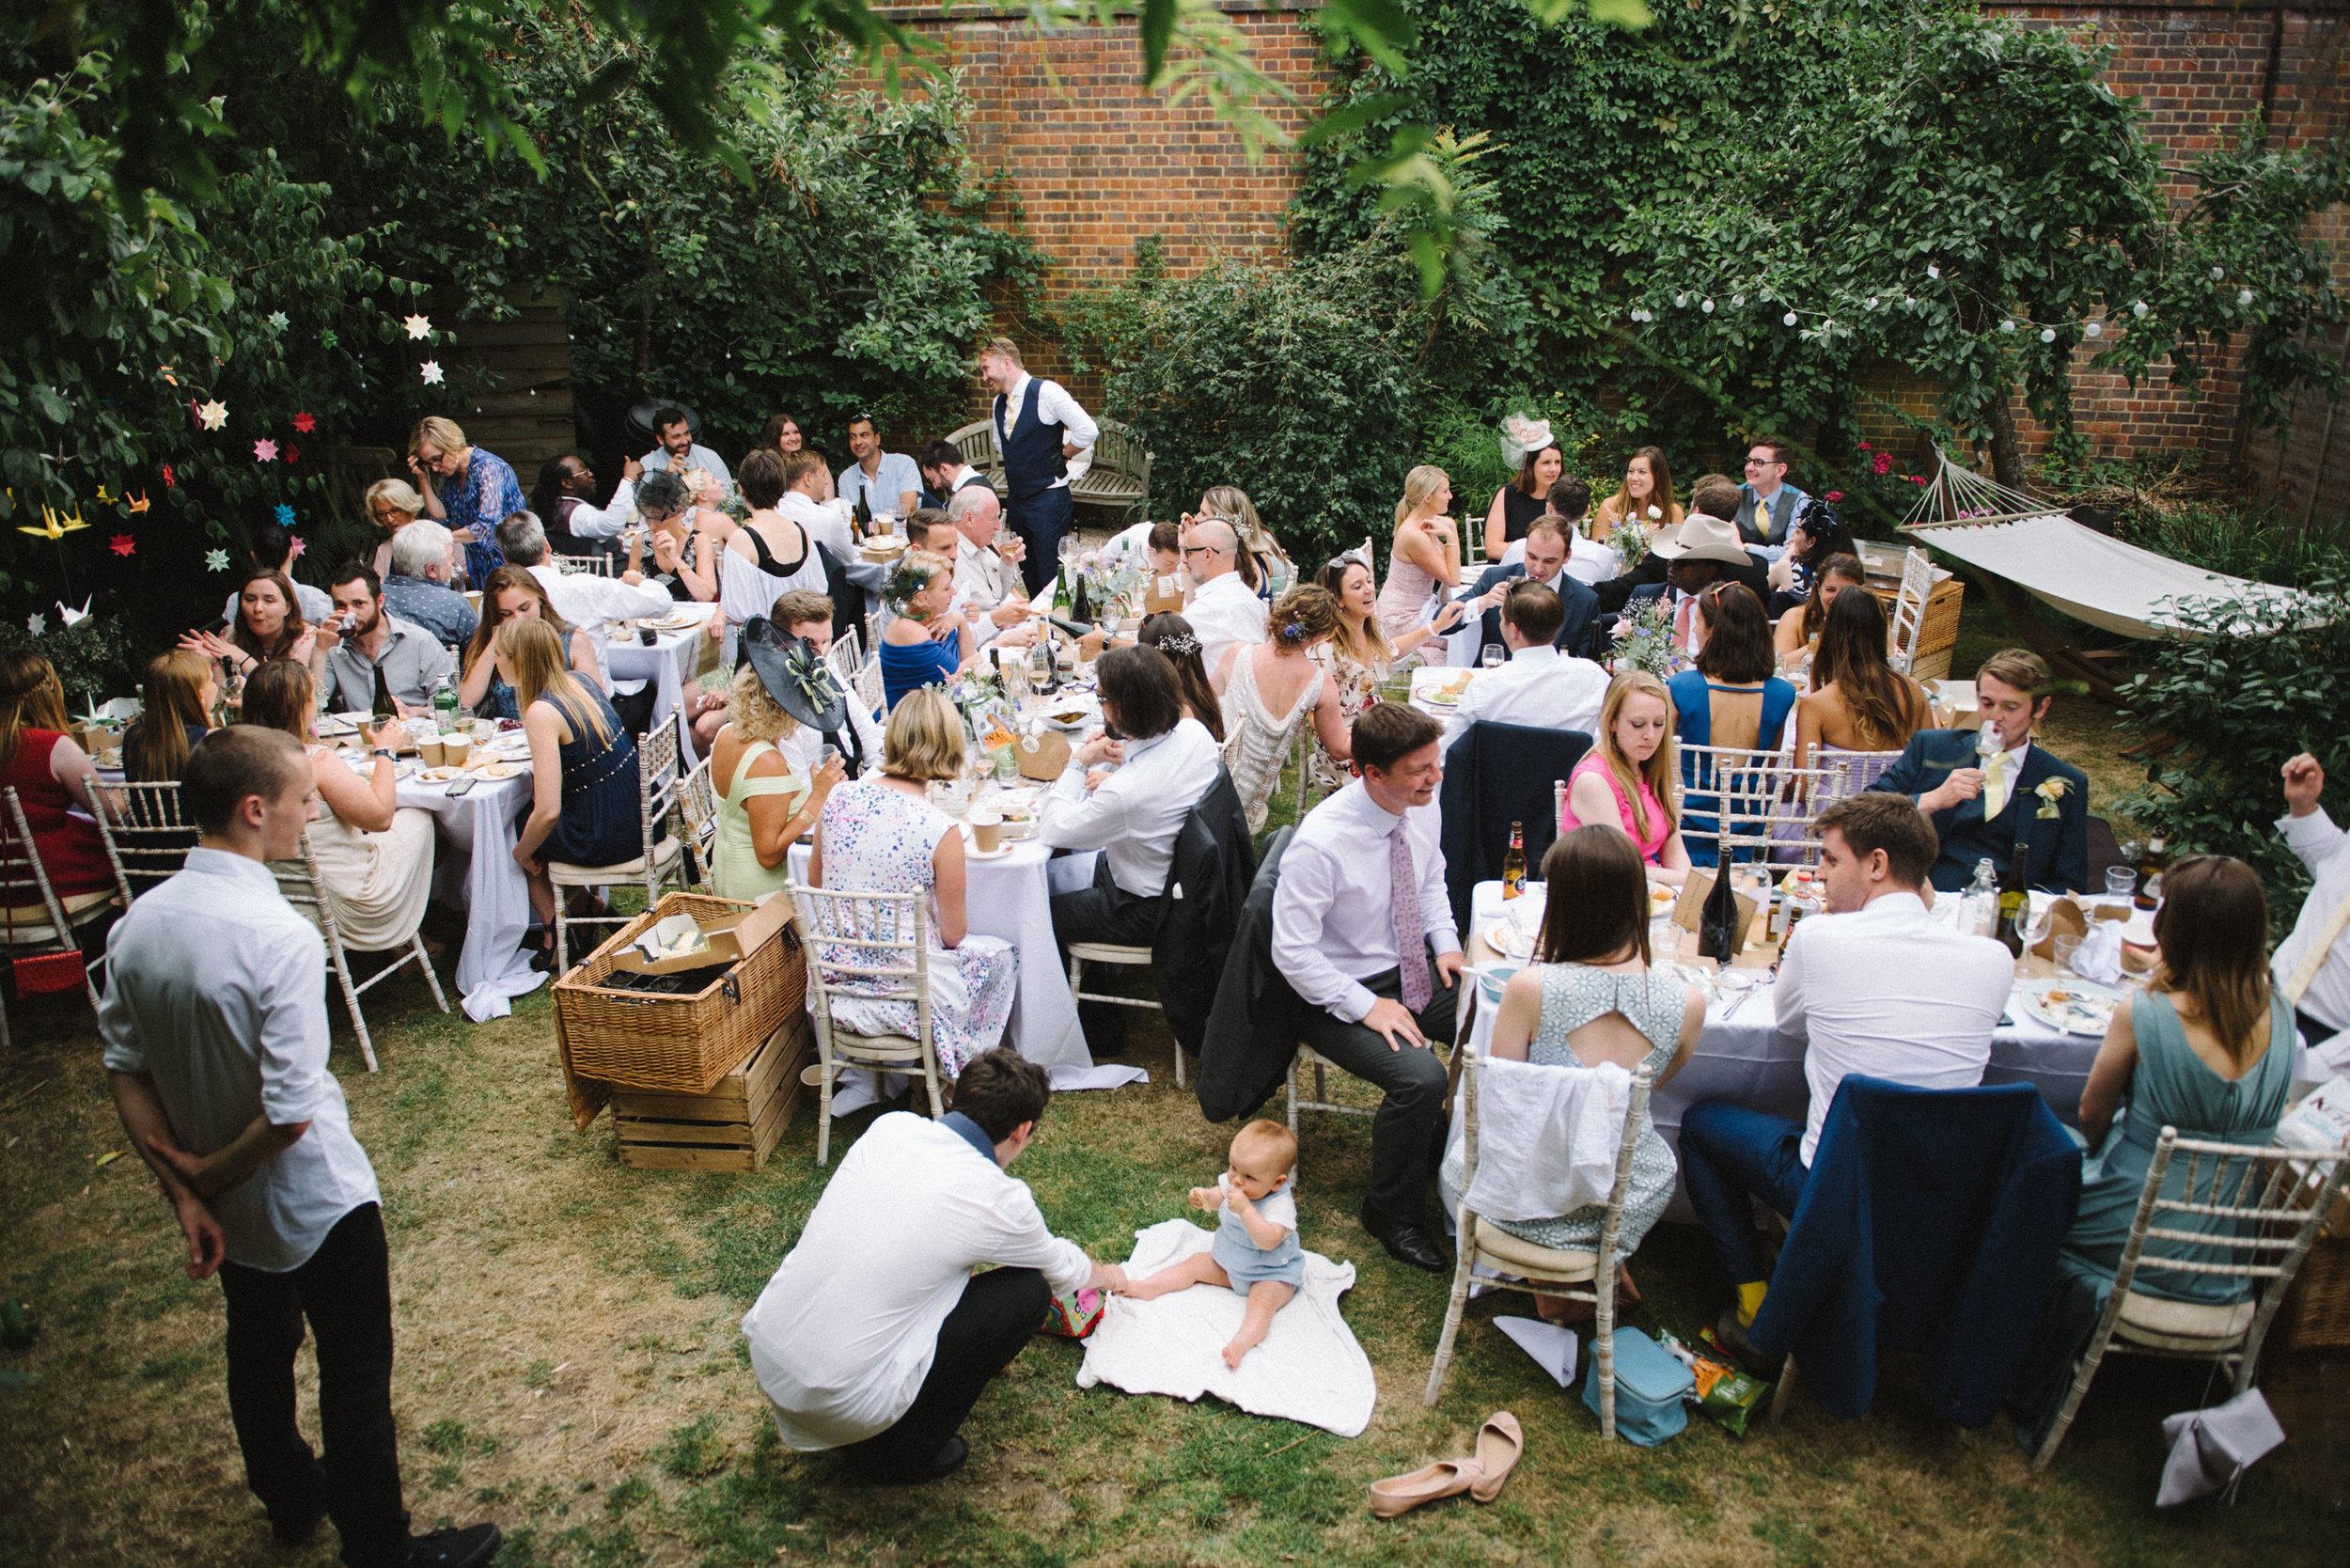 0229-LISA-DEVINE-PHOTOGRAPHY-ALTERNATIVE-WEDDING-PHOTOGRAPHY-SCOTLAND-DESTINATION-WEDDINGS-GLASGOW-WEDDINGS-COOL-WEDDINGS-STYLISH-WEDDINGS.JPG